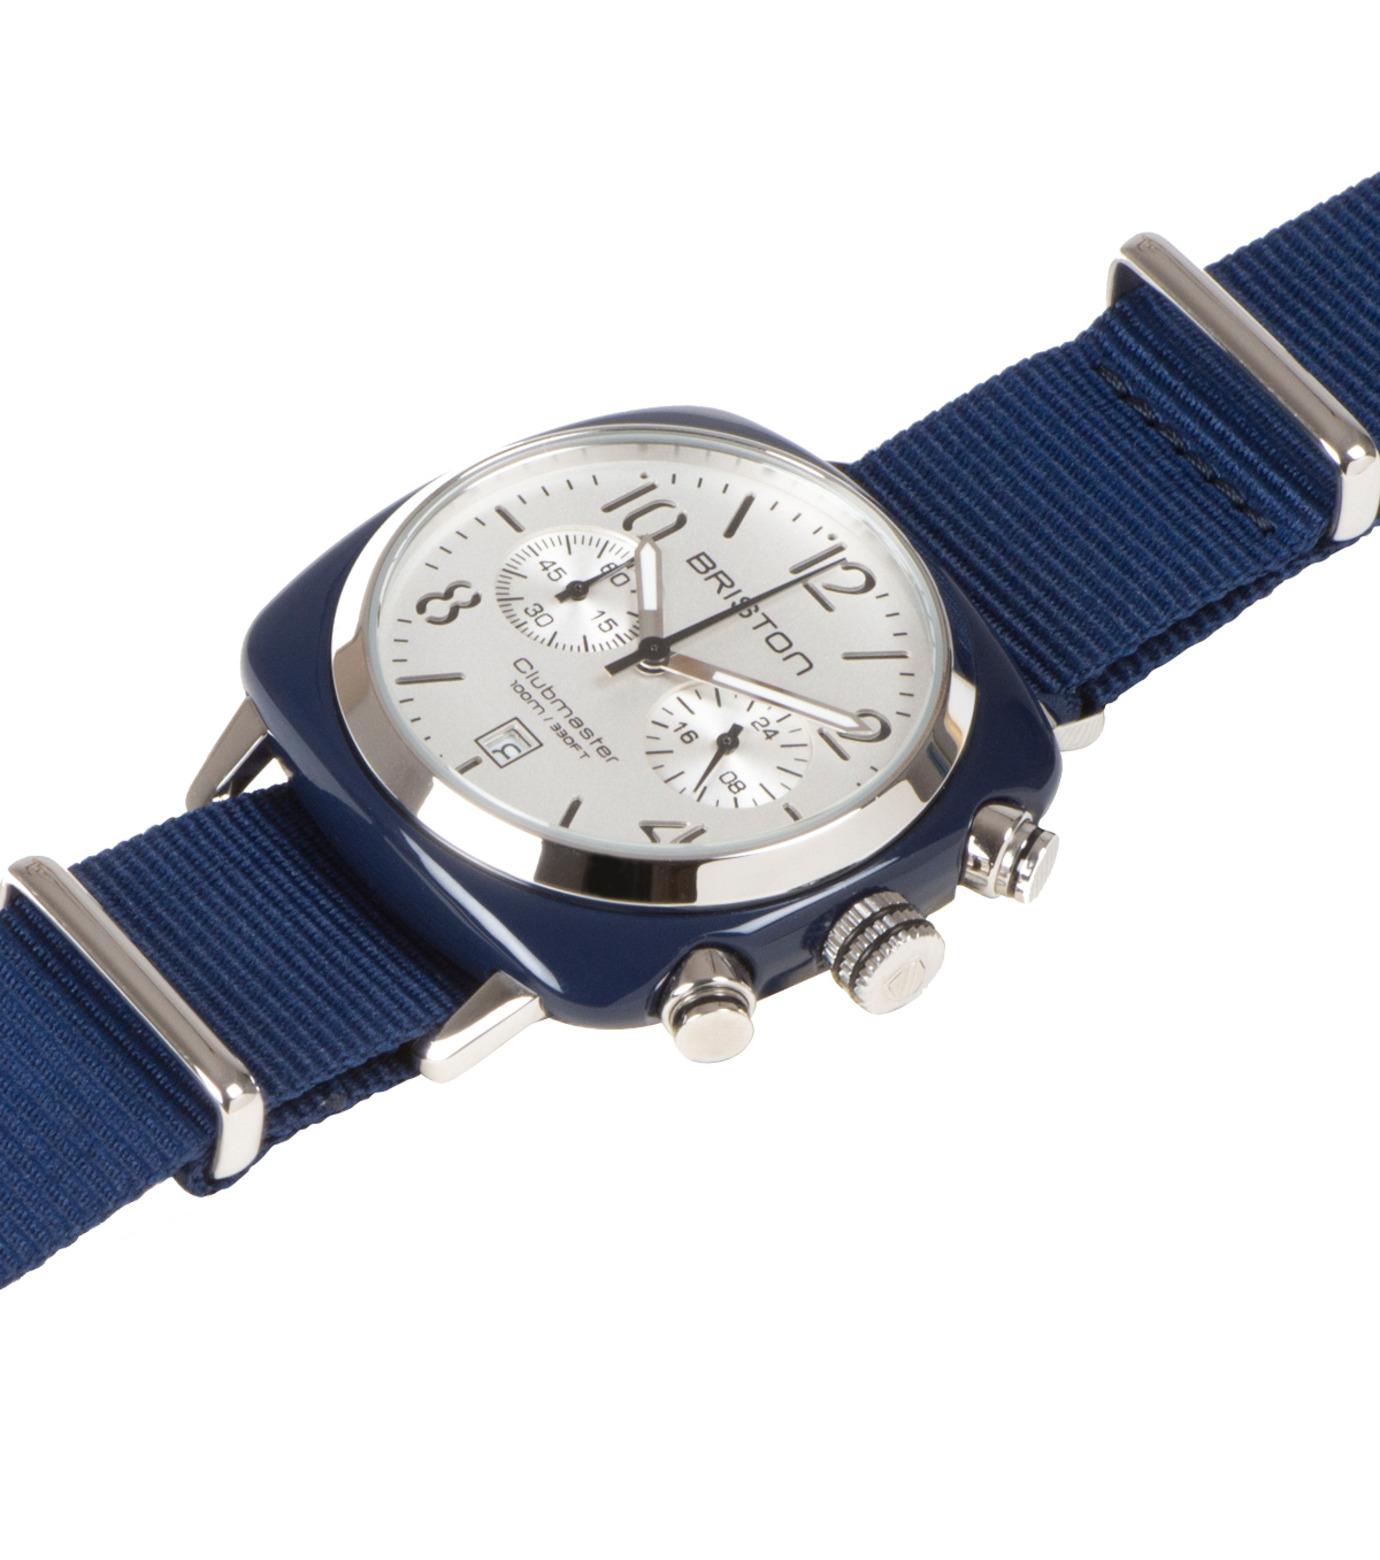 BRISTON(ブリストン)のCHRONO DATE-BLUE(ウォッチ/watch)-DATE-92 拡大詳細画像3